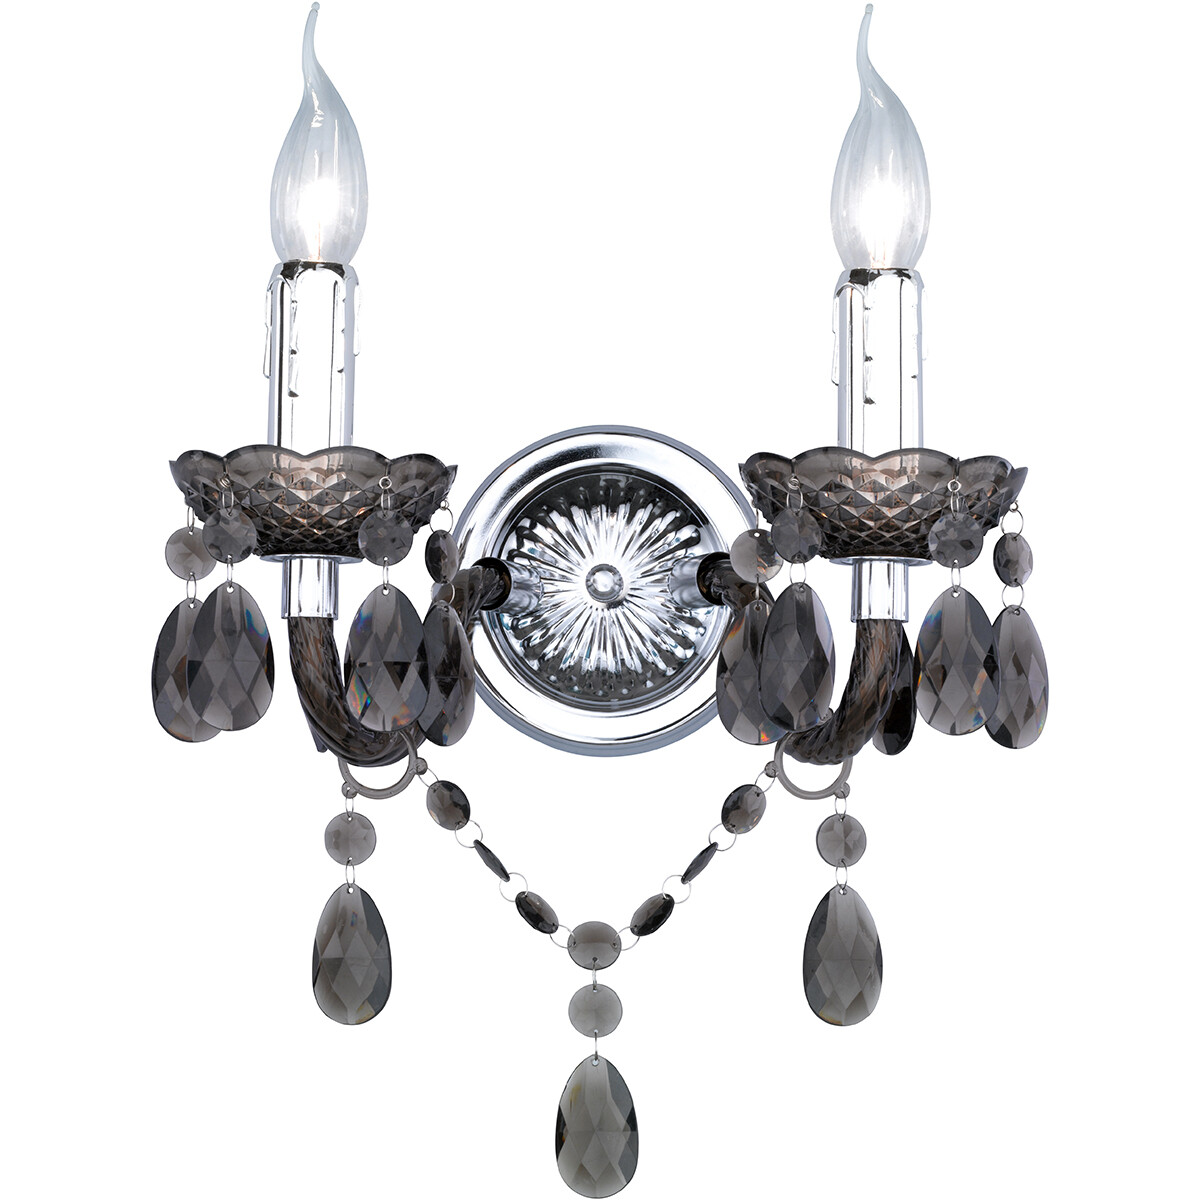 LED Wandlamp - Wandverlichting - Trion Lucy - E14 Fitting - Rond - Mat Zwart - Aluminium